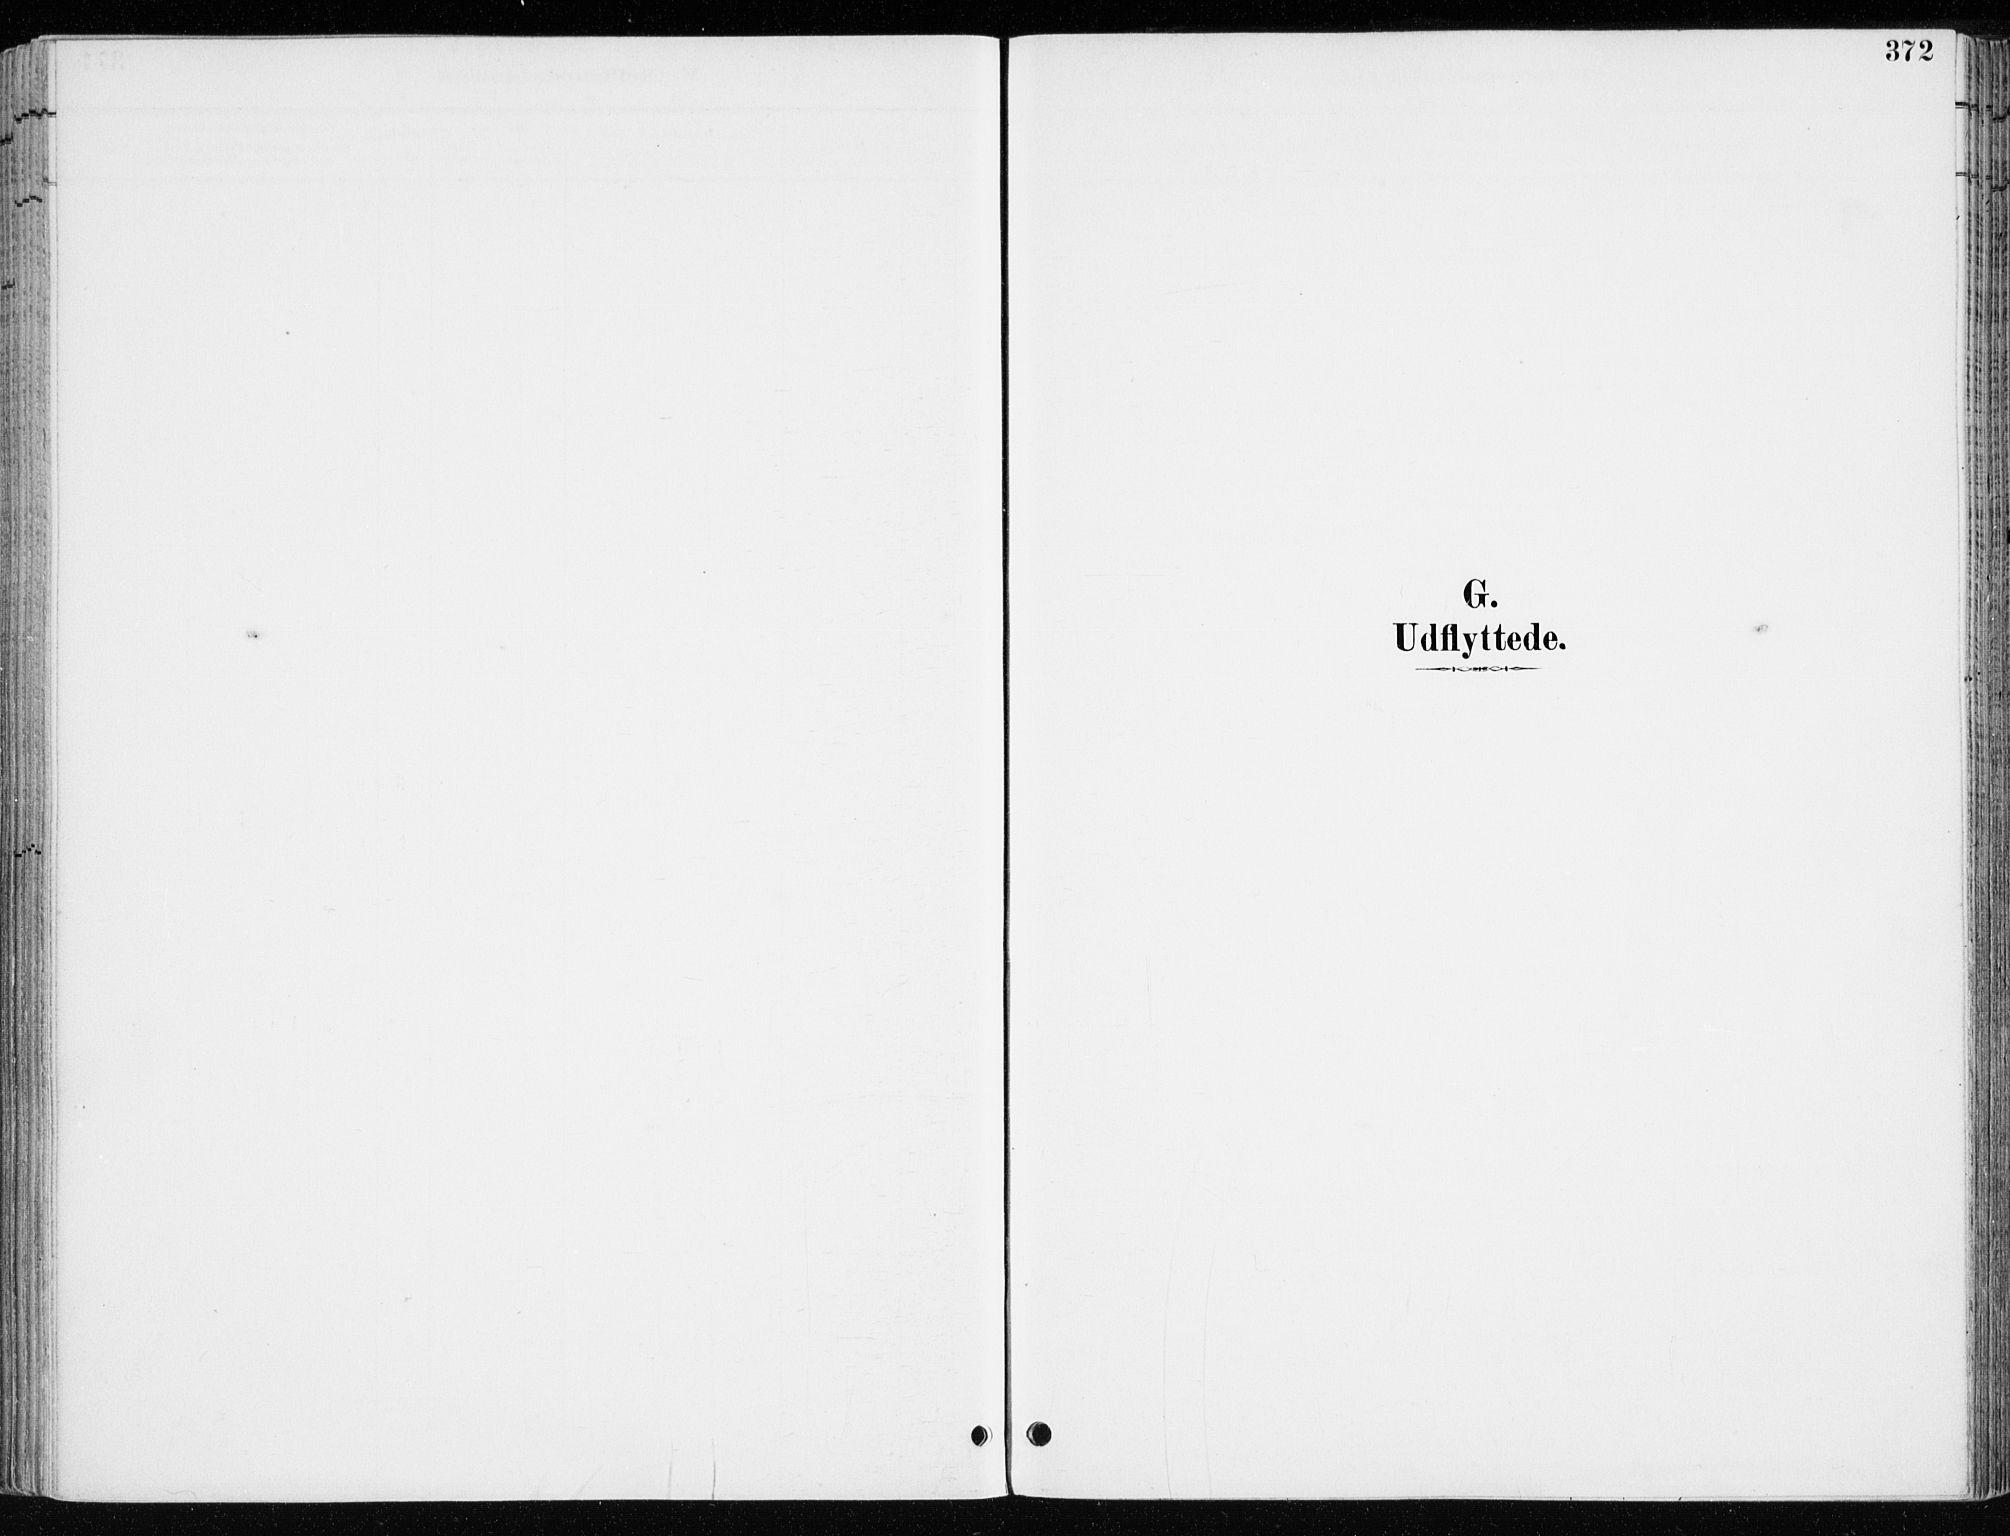 SAH, Løten prestekontor, K/Ka/L0010: Ministerialbok nr. 10, 1892-1907, s. 372